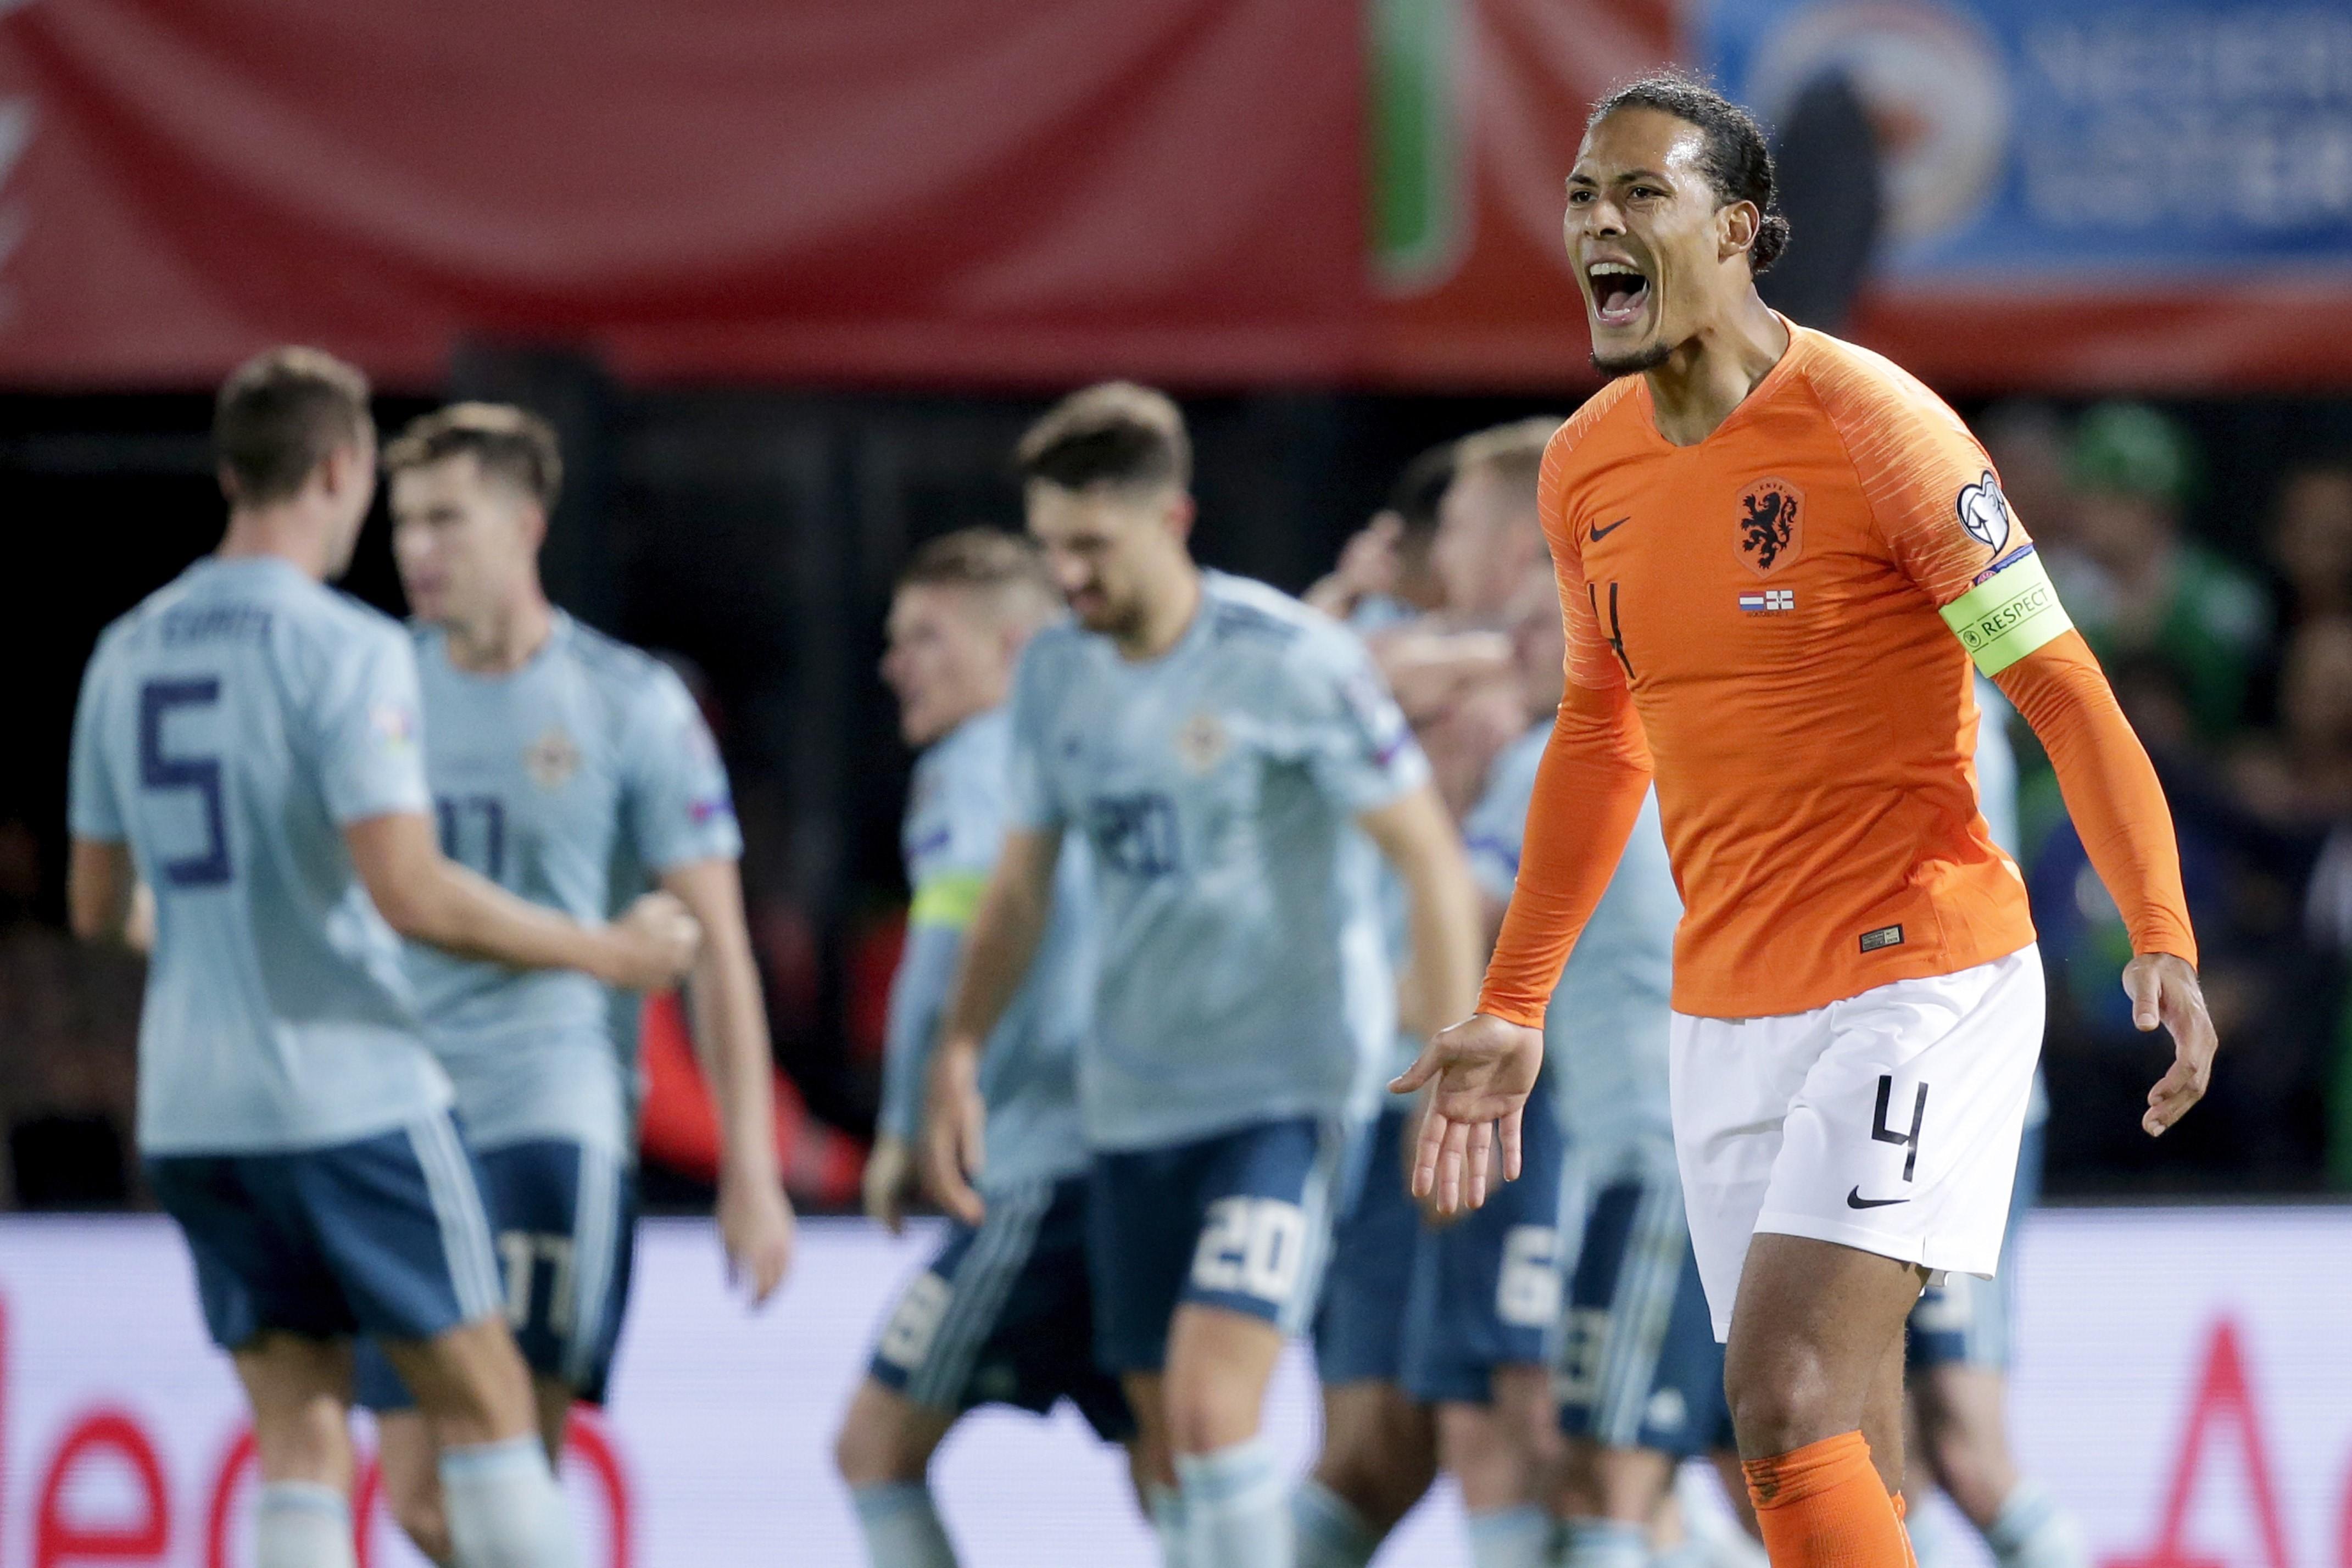 Virgil van Dijk of Holland during the EURO Qualifier match between Holland v Northern Ireland at the Feijenoord Stadium on October 10, 2019